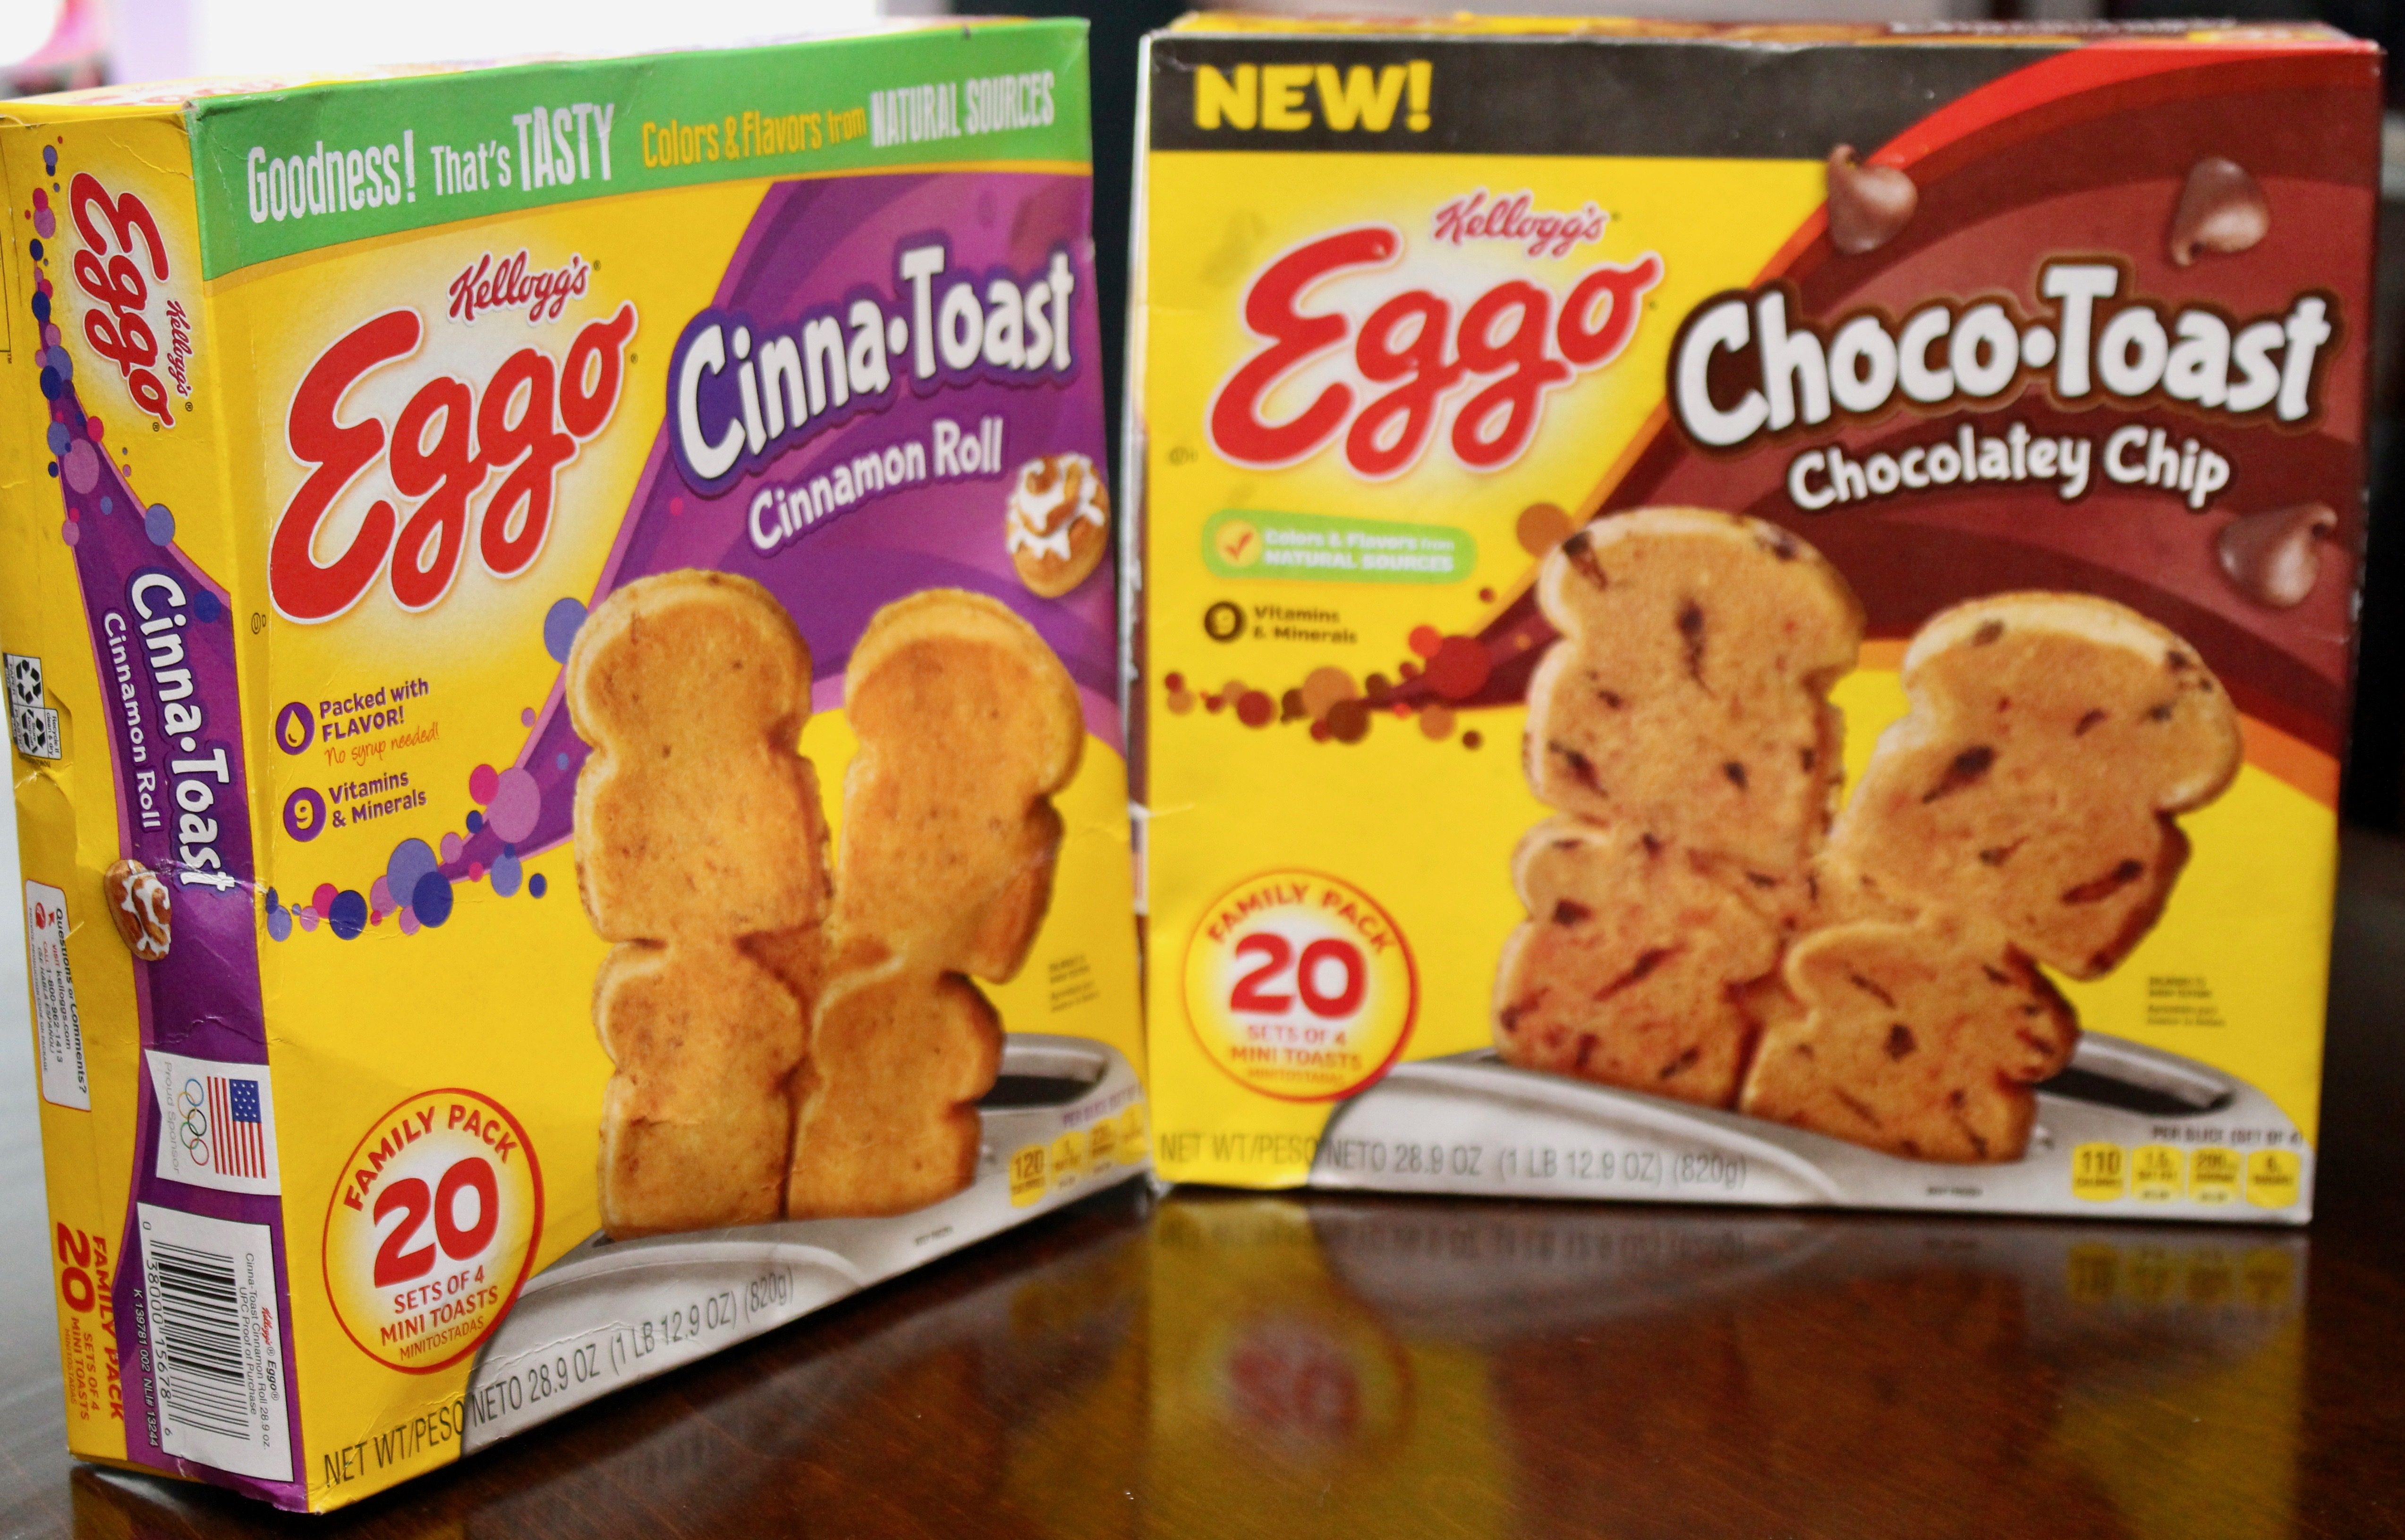 Eggo Cinna-Toast and Eggo Choco-Toast